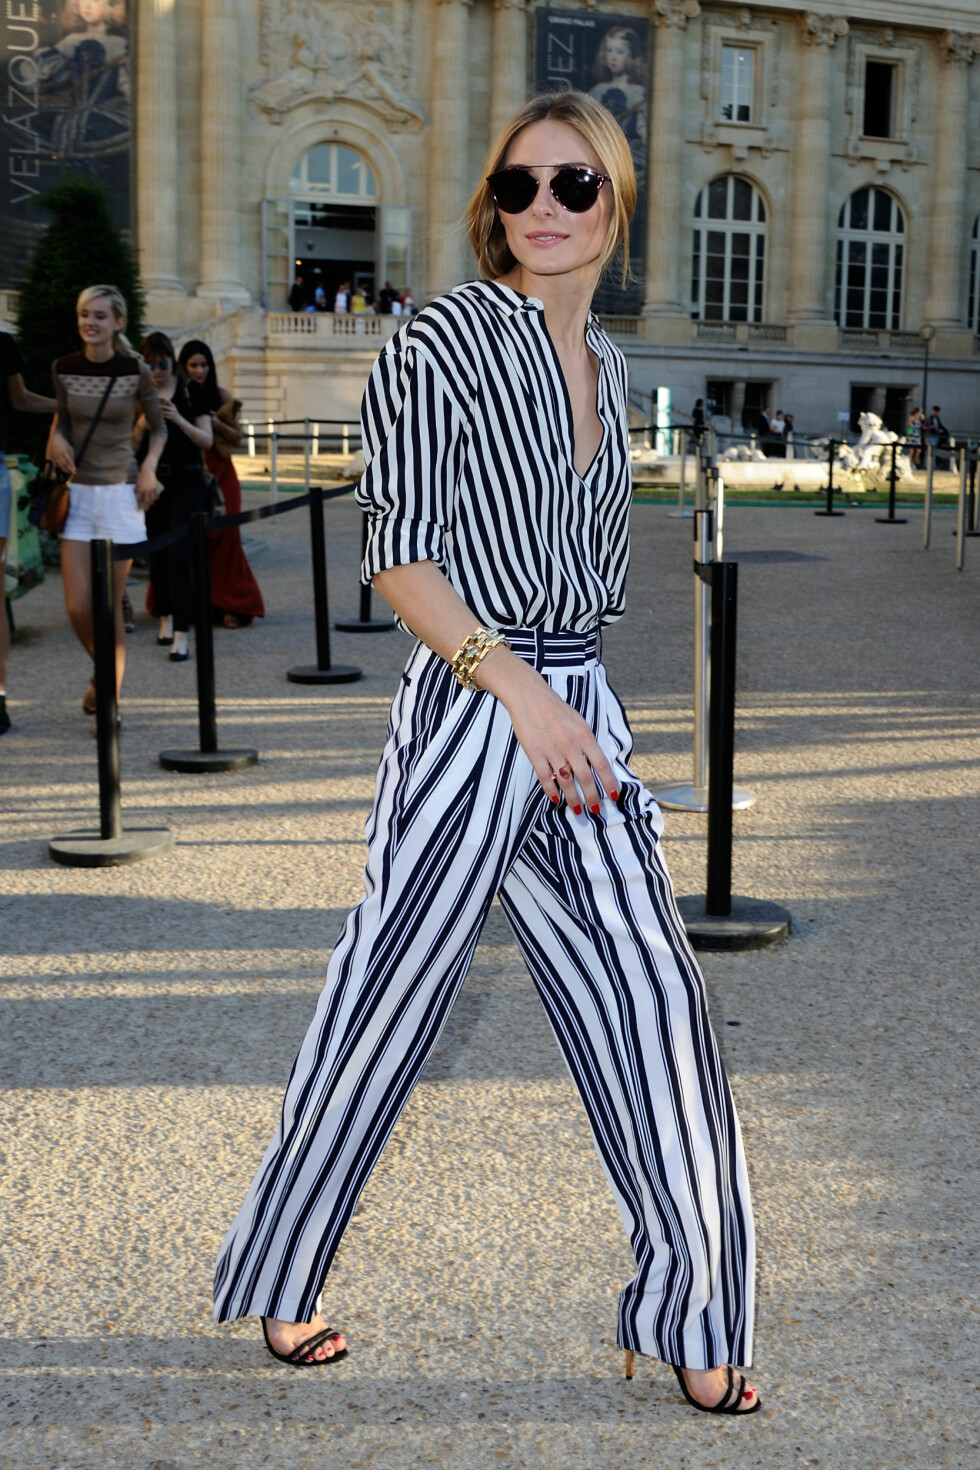 PÅ FASHION WEEK: Olivia Palermo i et stripete sett før couture-visningen til Giambattista Valli.  Foto: Abaca